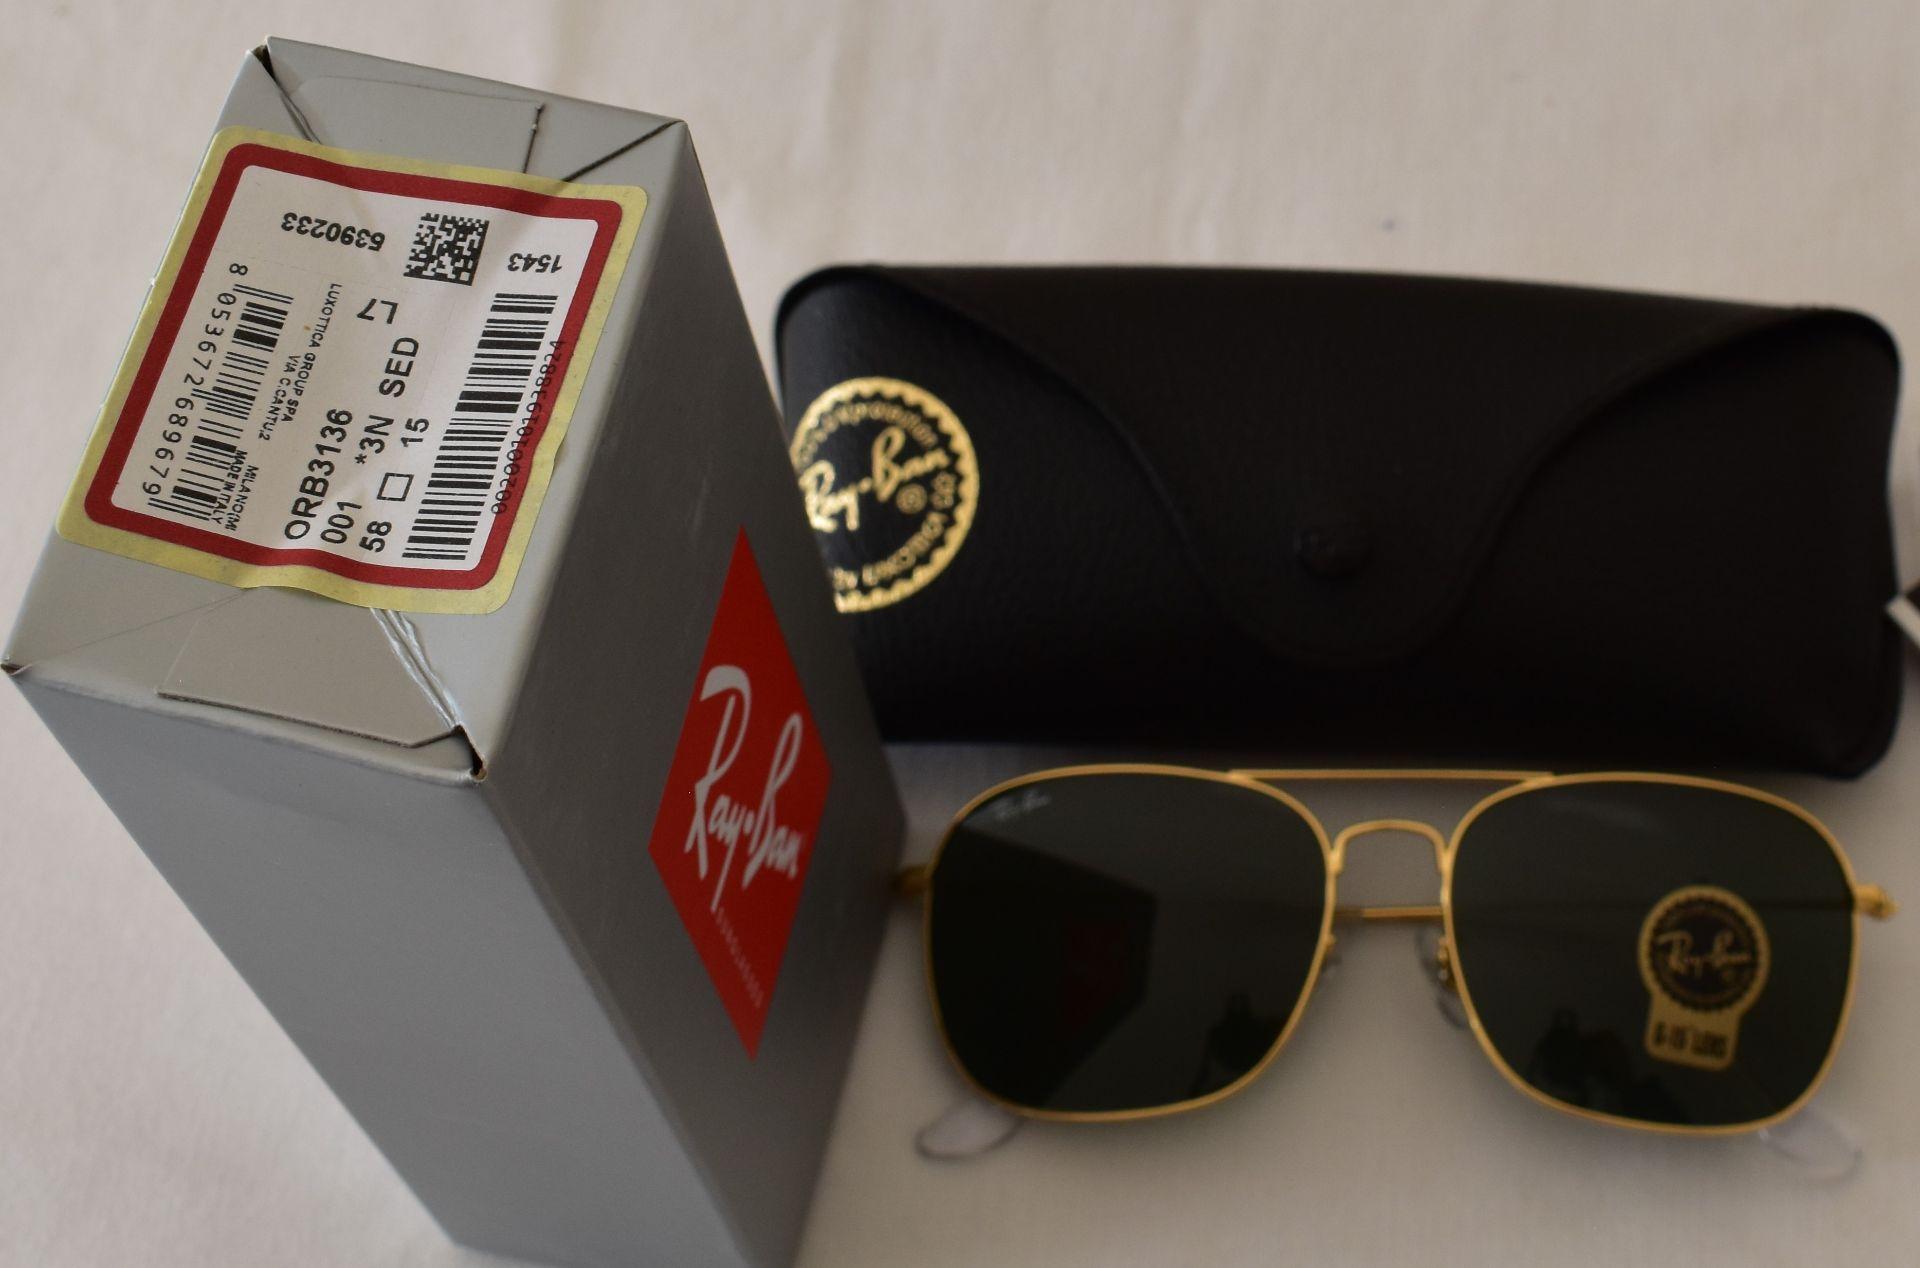 Ray Ban Sunglasses ORB3136 001 *3N - Image 2 of 2